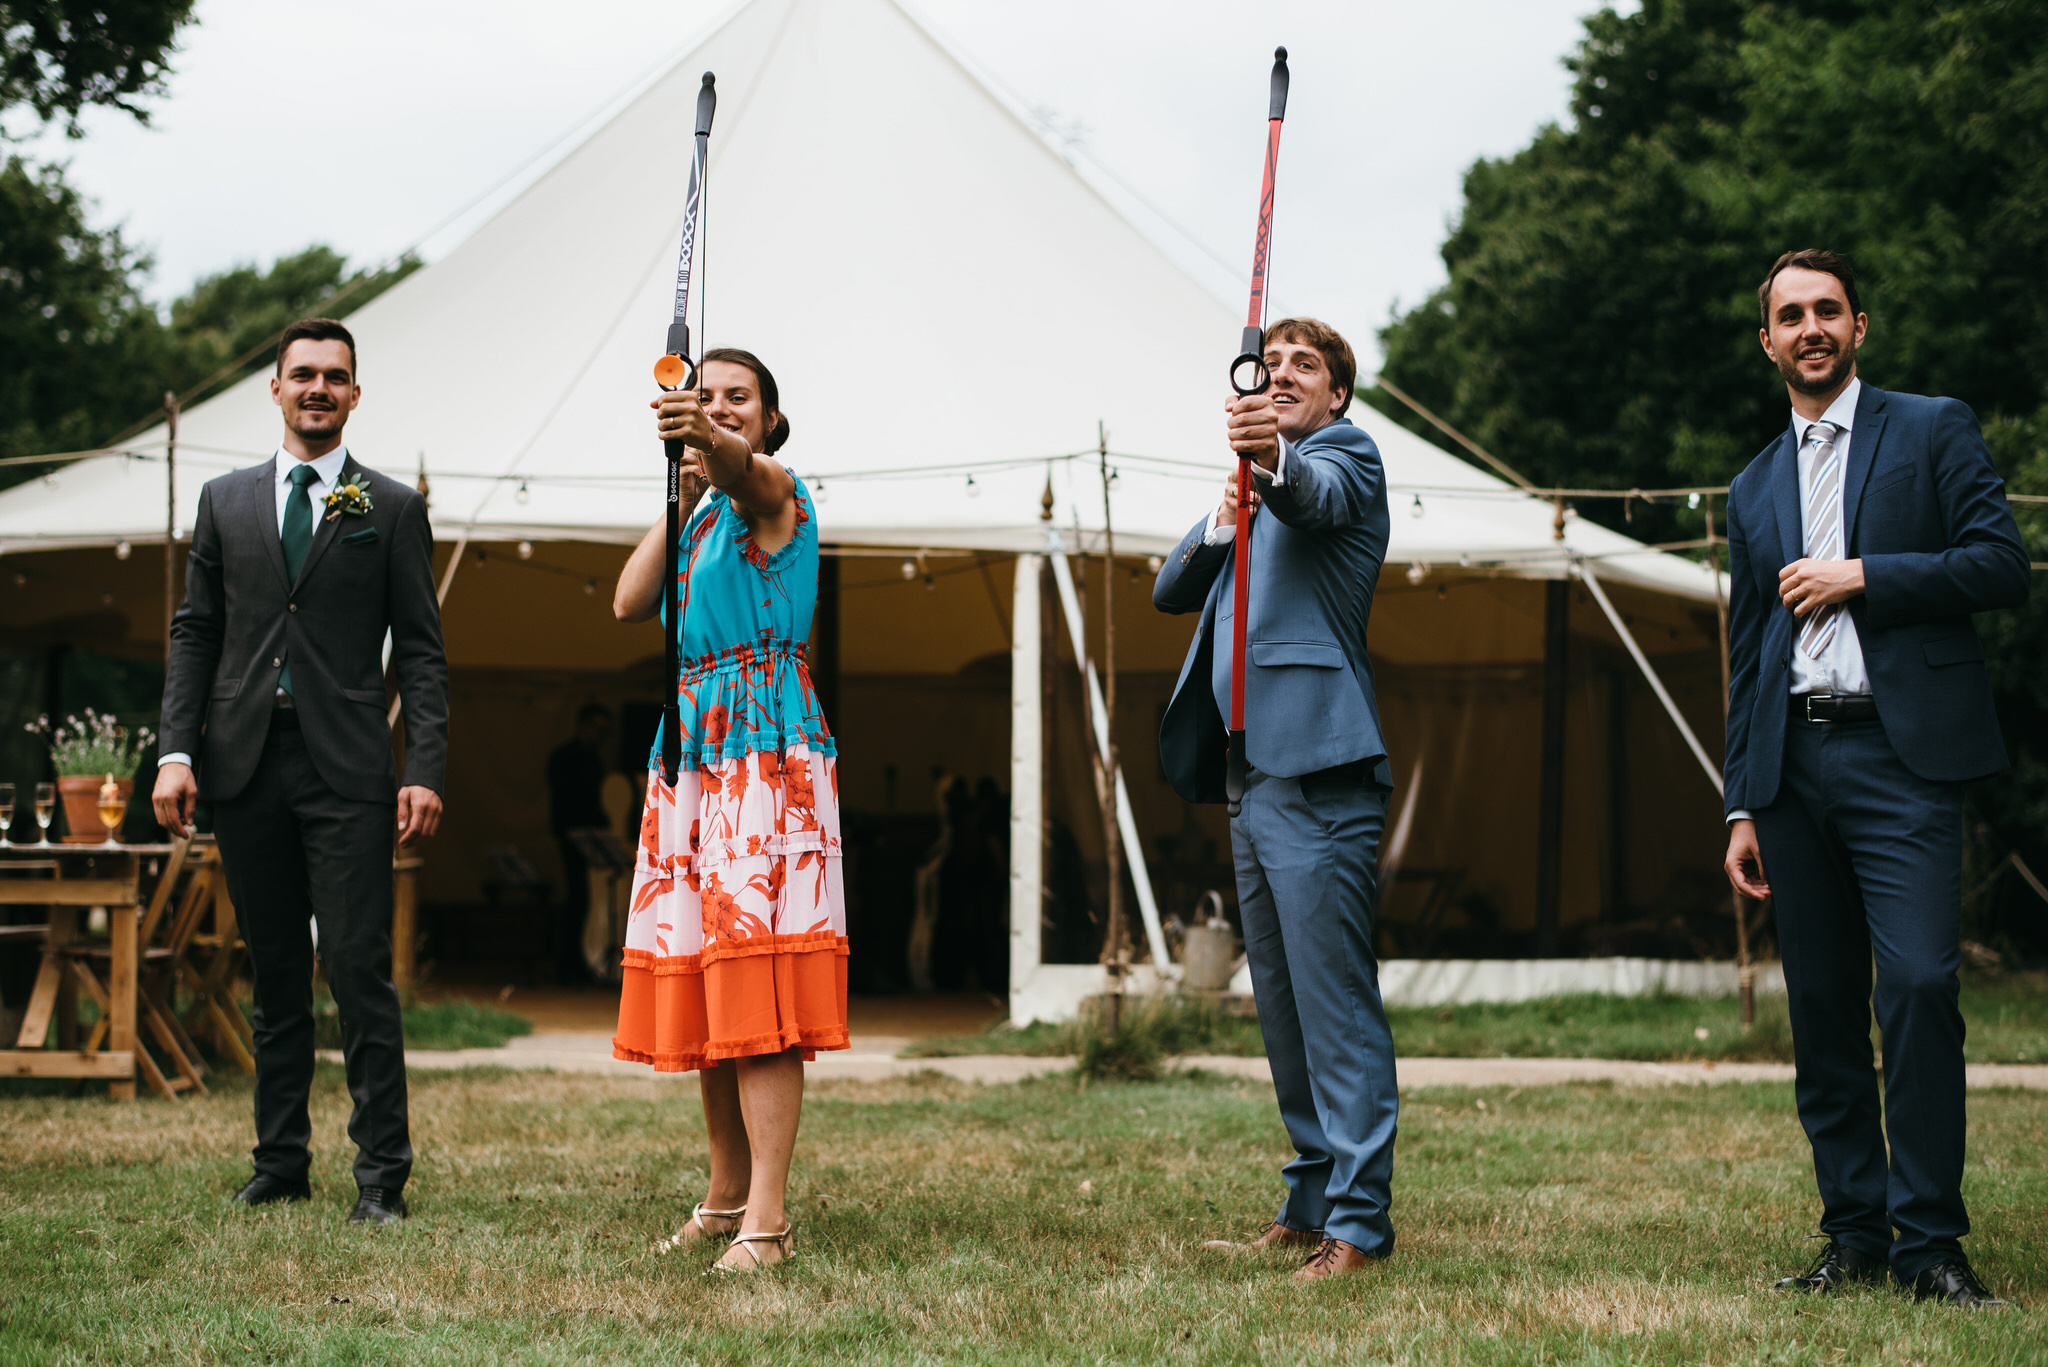 The Dreys Kent wedding reception